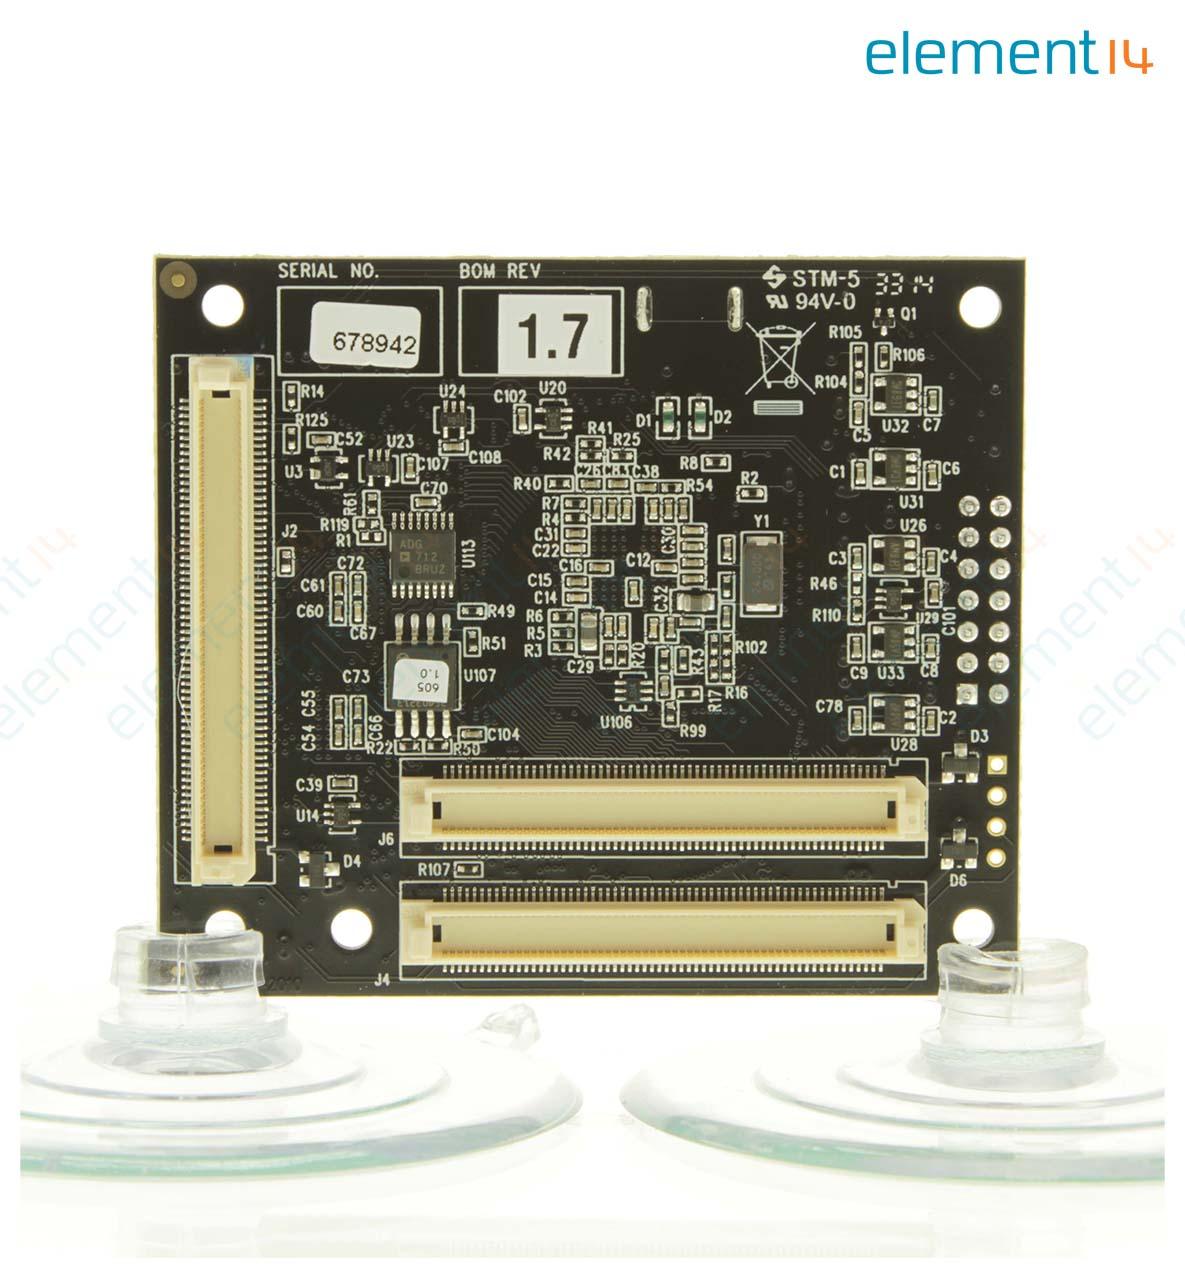 Eval Sdp Cb1z Analog Devices Evaluation Board Blackfin B Usb Circuit Rack For Raspberry Pi Multi Gpio Pcb Ebay Add To Compare